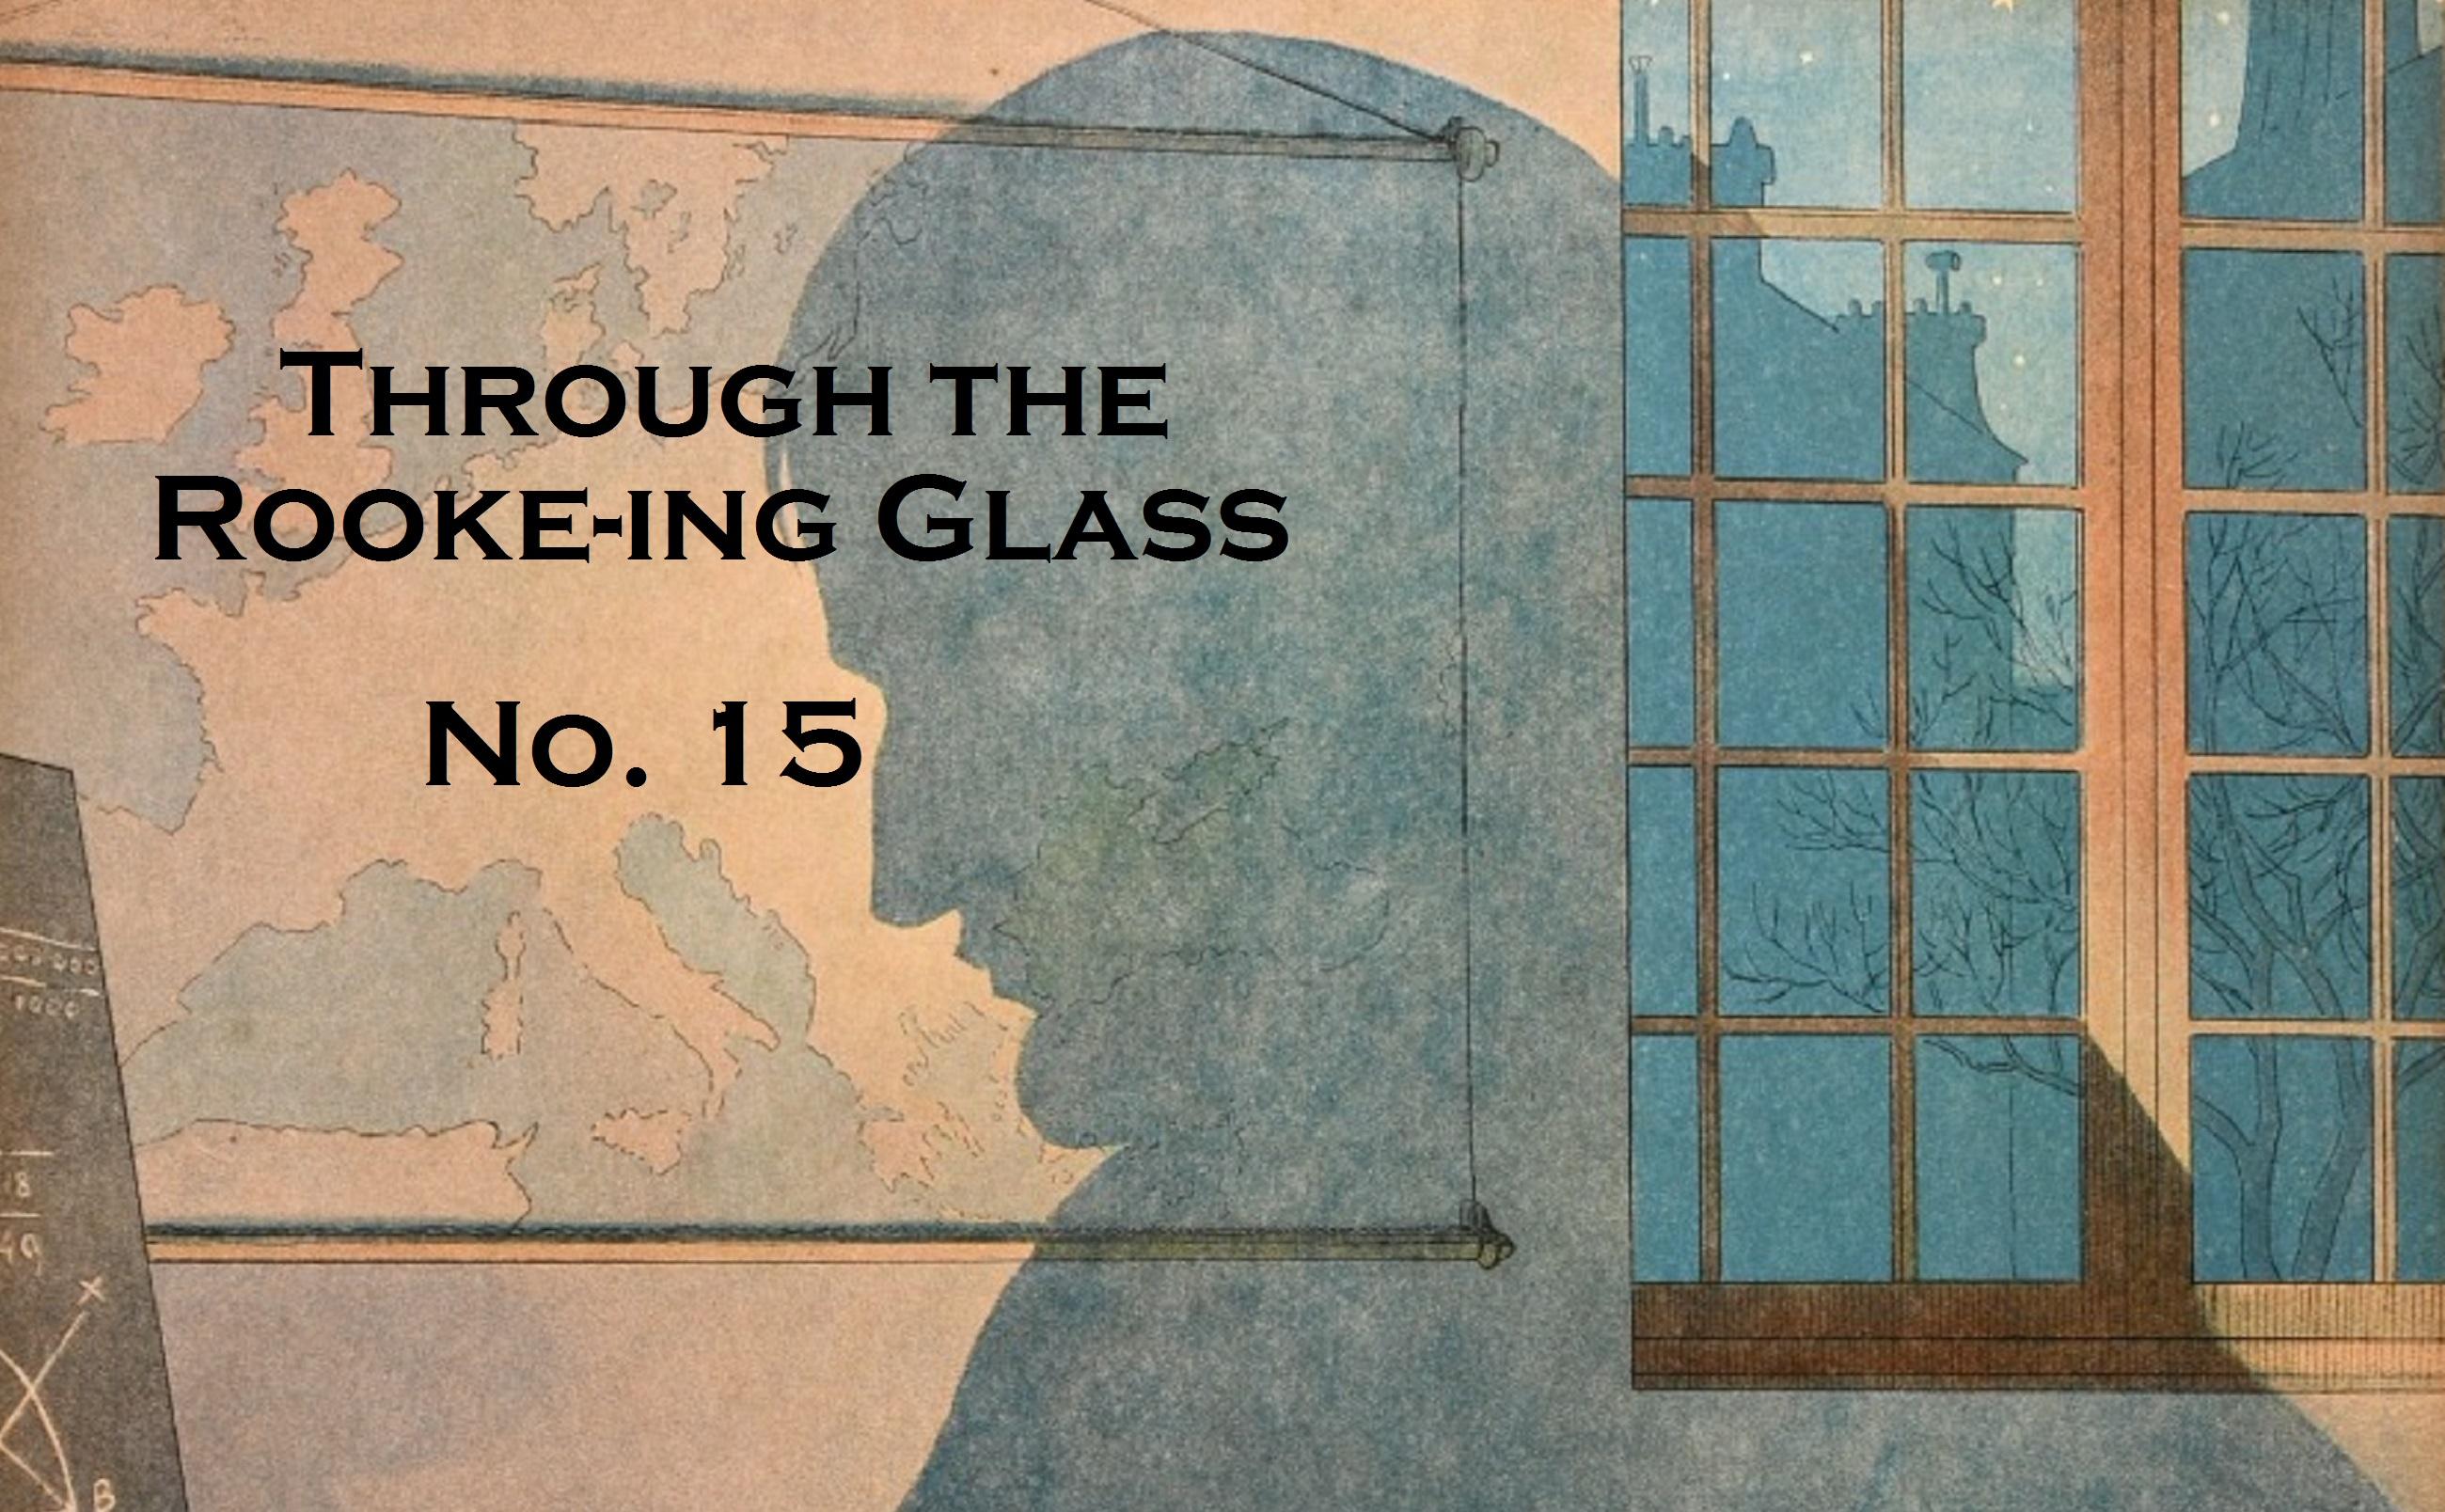 Through the Rooke-ing Glass No. 15